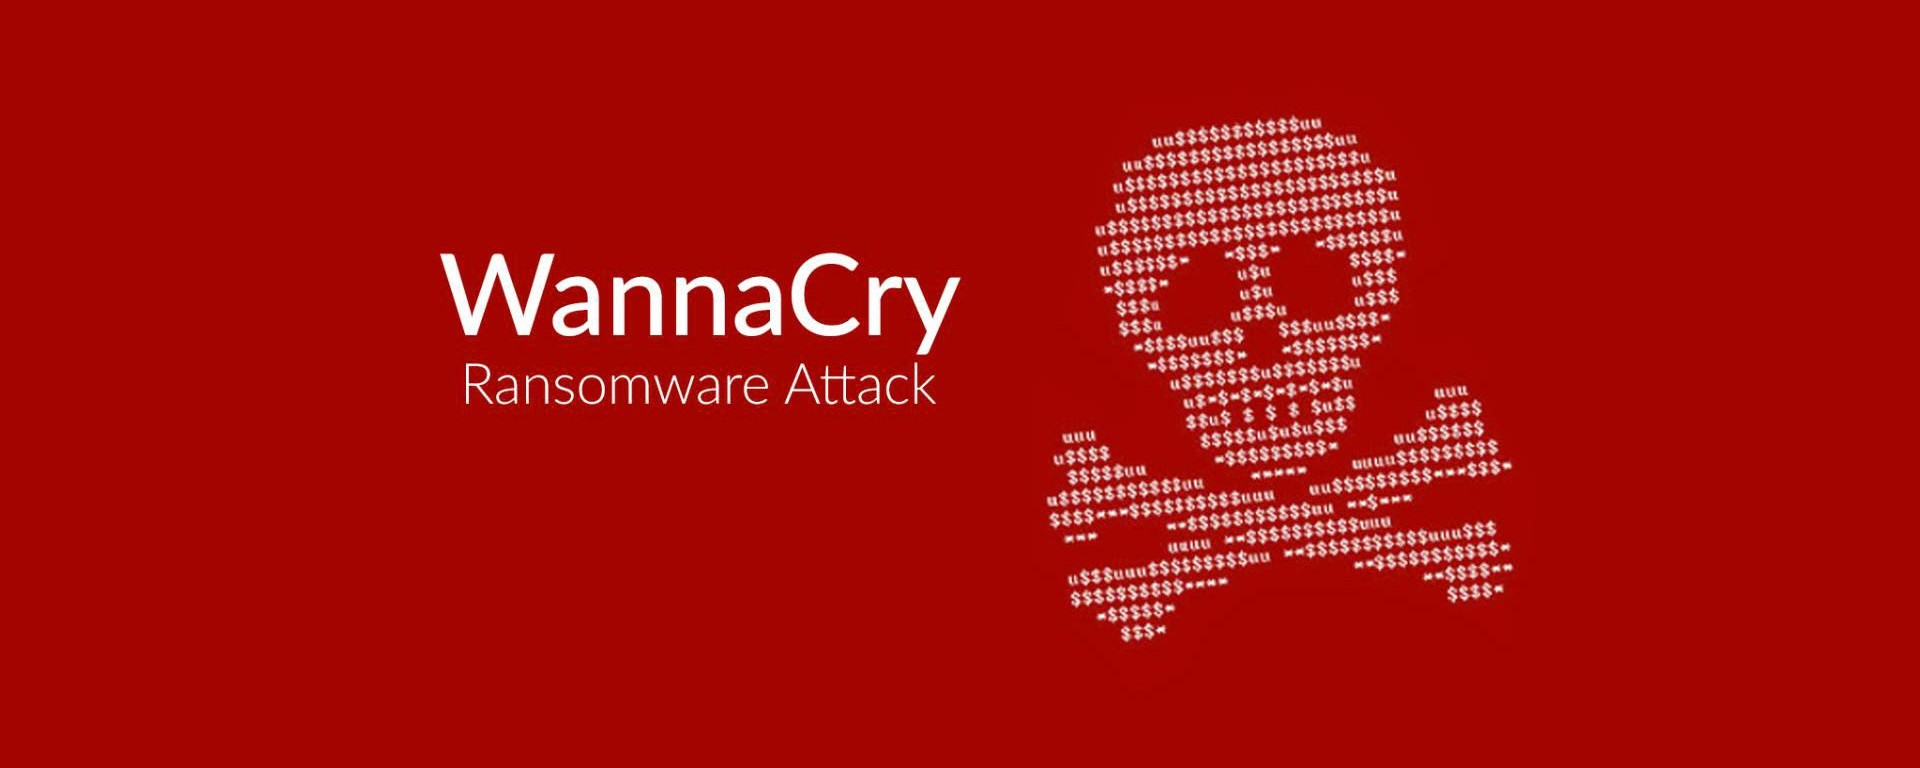 El patch-tuesday corrige un posible Wannacry 2.0